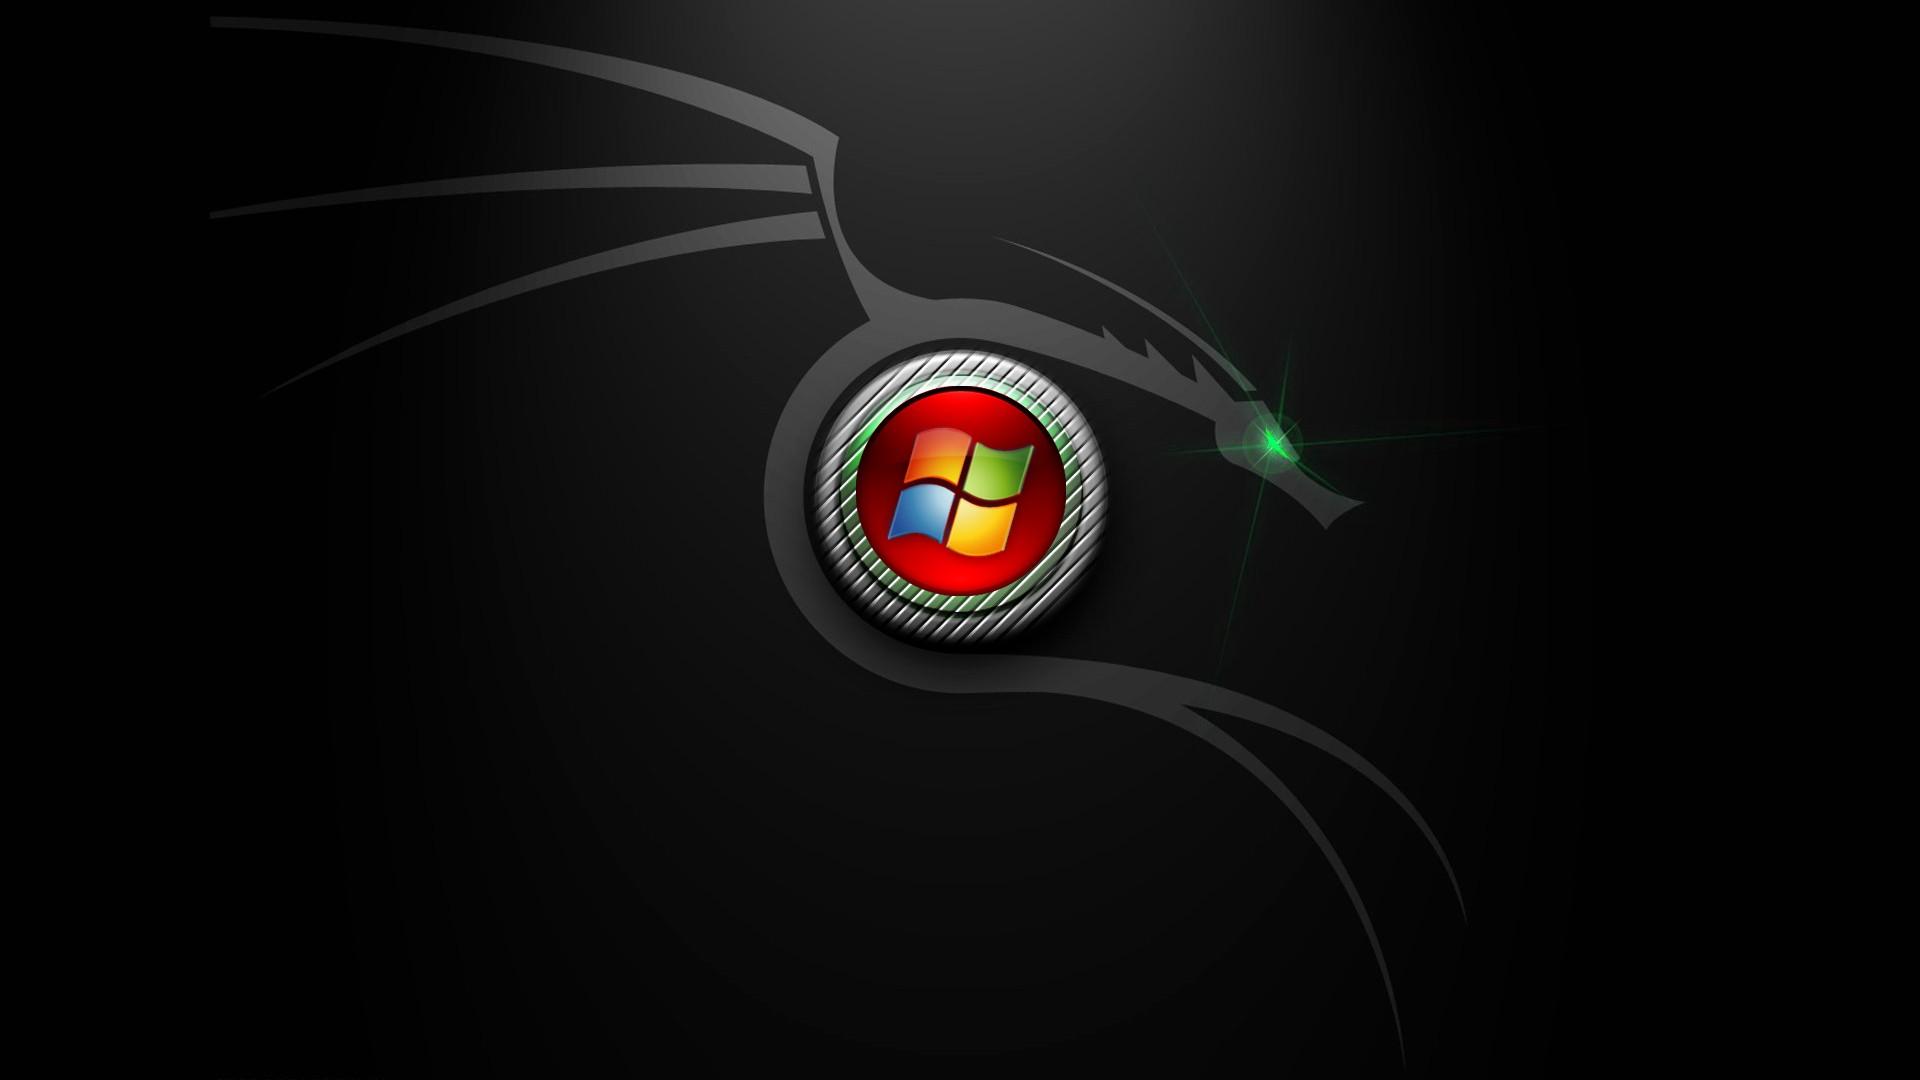 Windows photo wizard free download Ganesha - Wikipedia